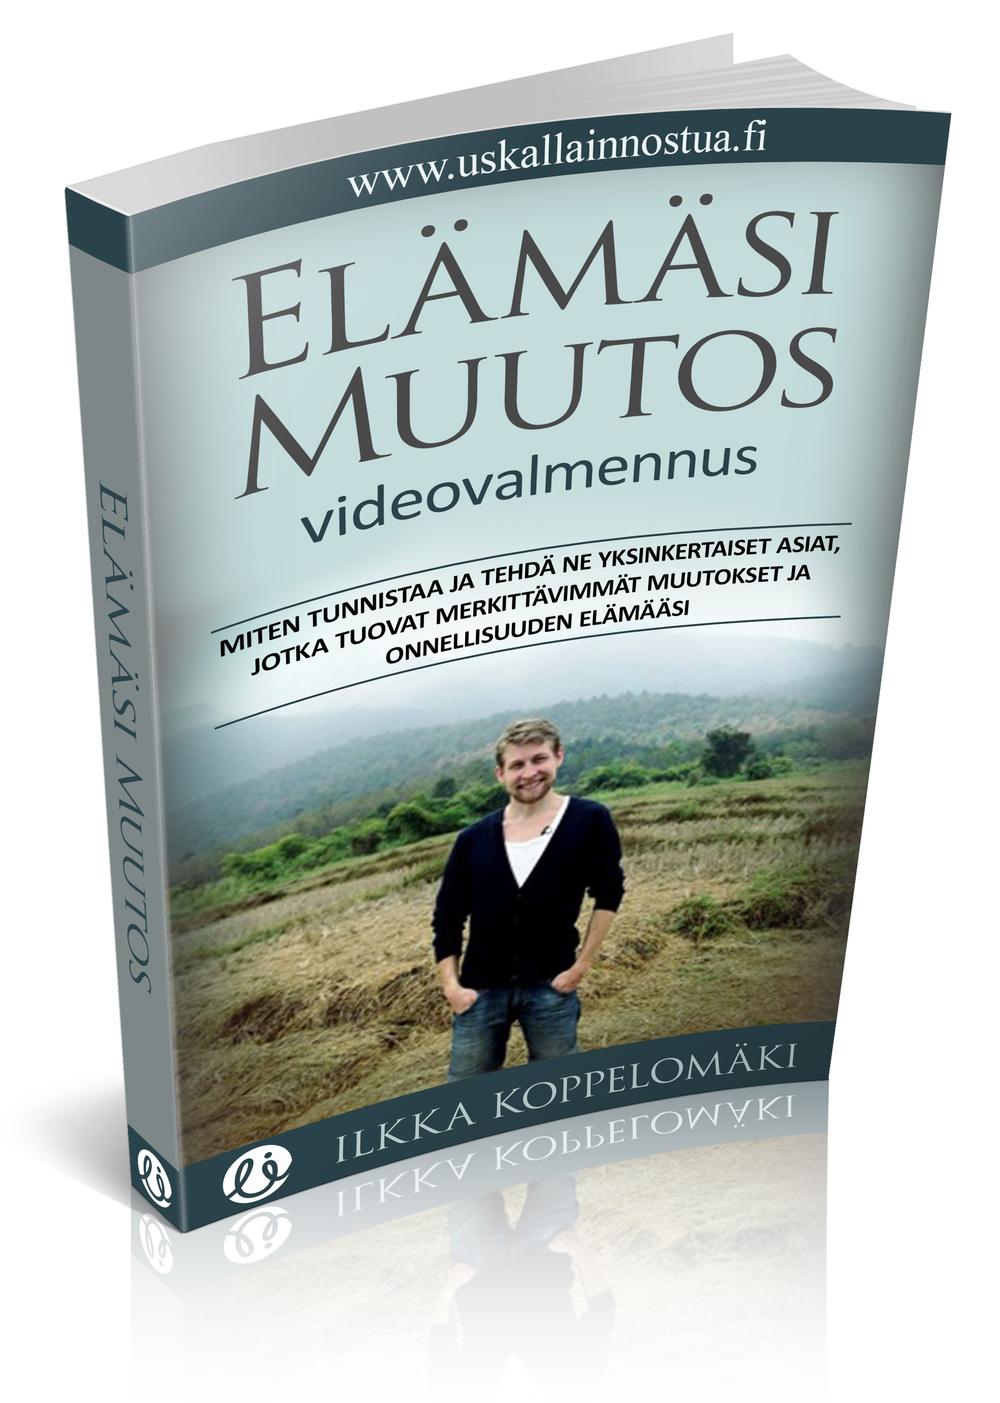 elamasi-muutos-videovalmennus-kansi-3d